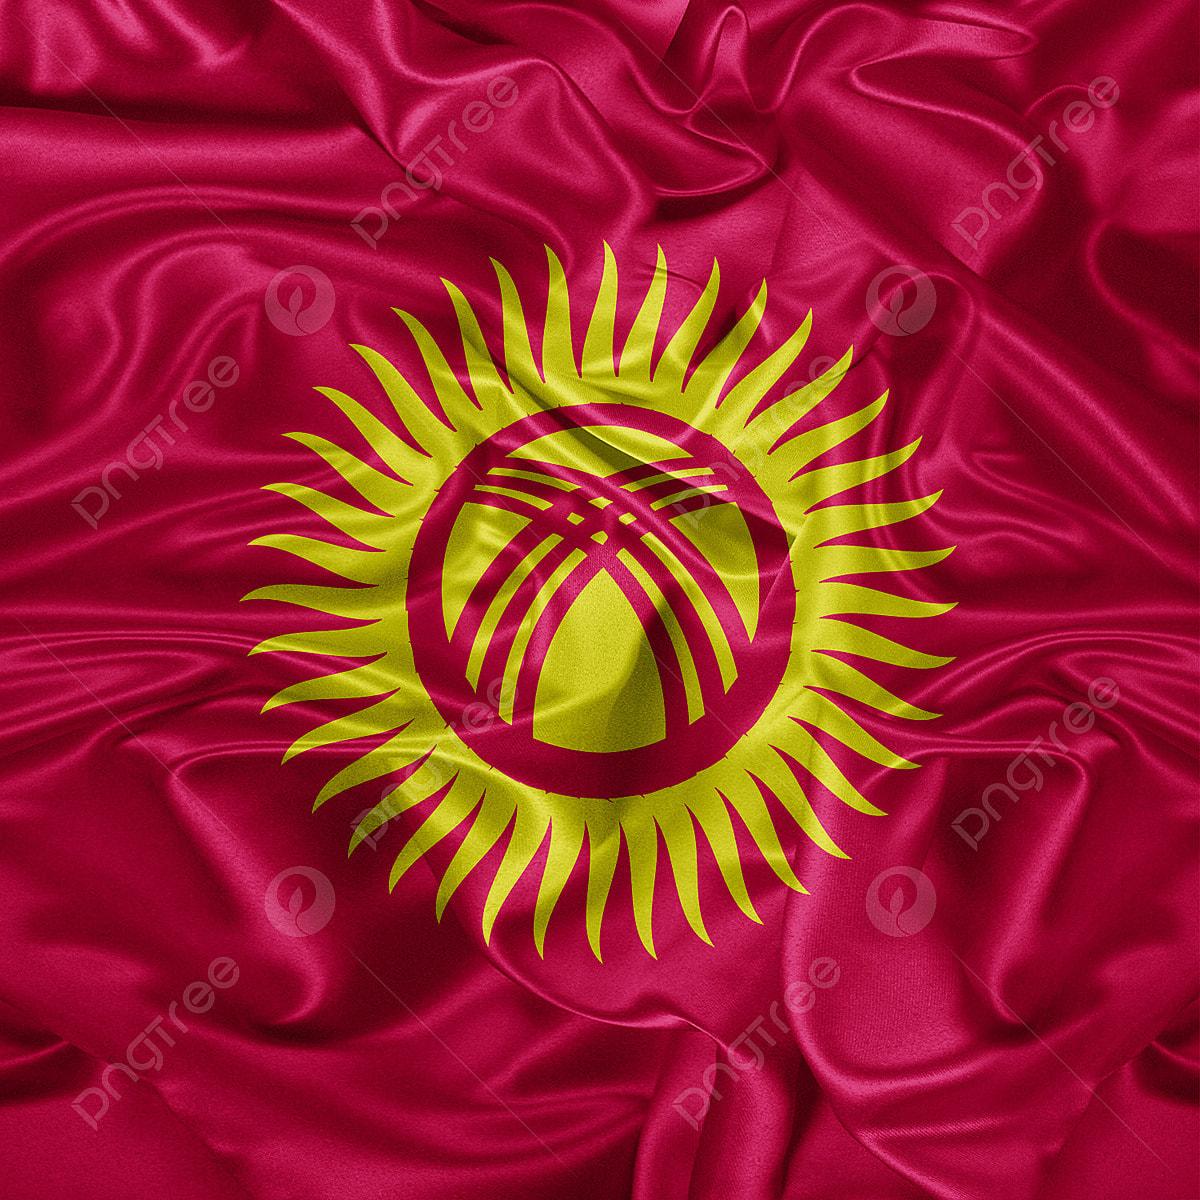 фотографии флаг киргизии фото картинки условия содержания аквариуме